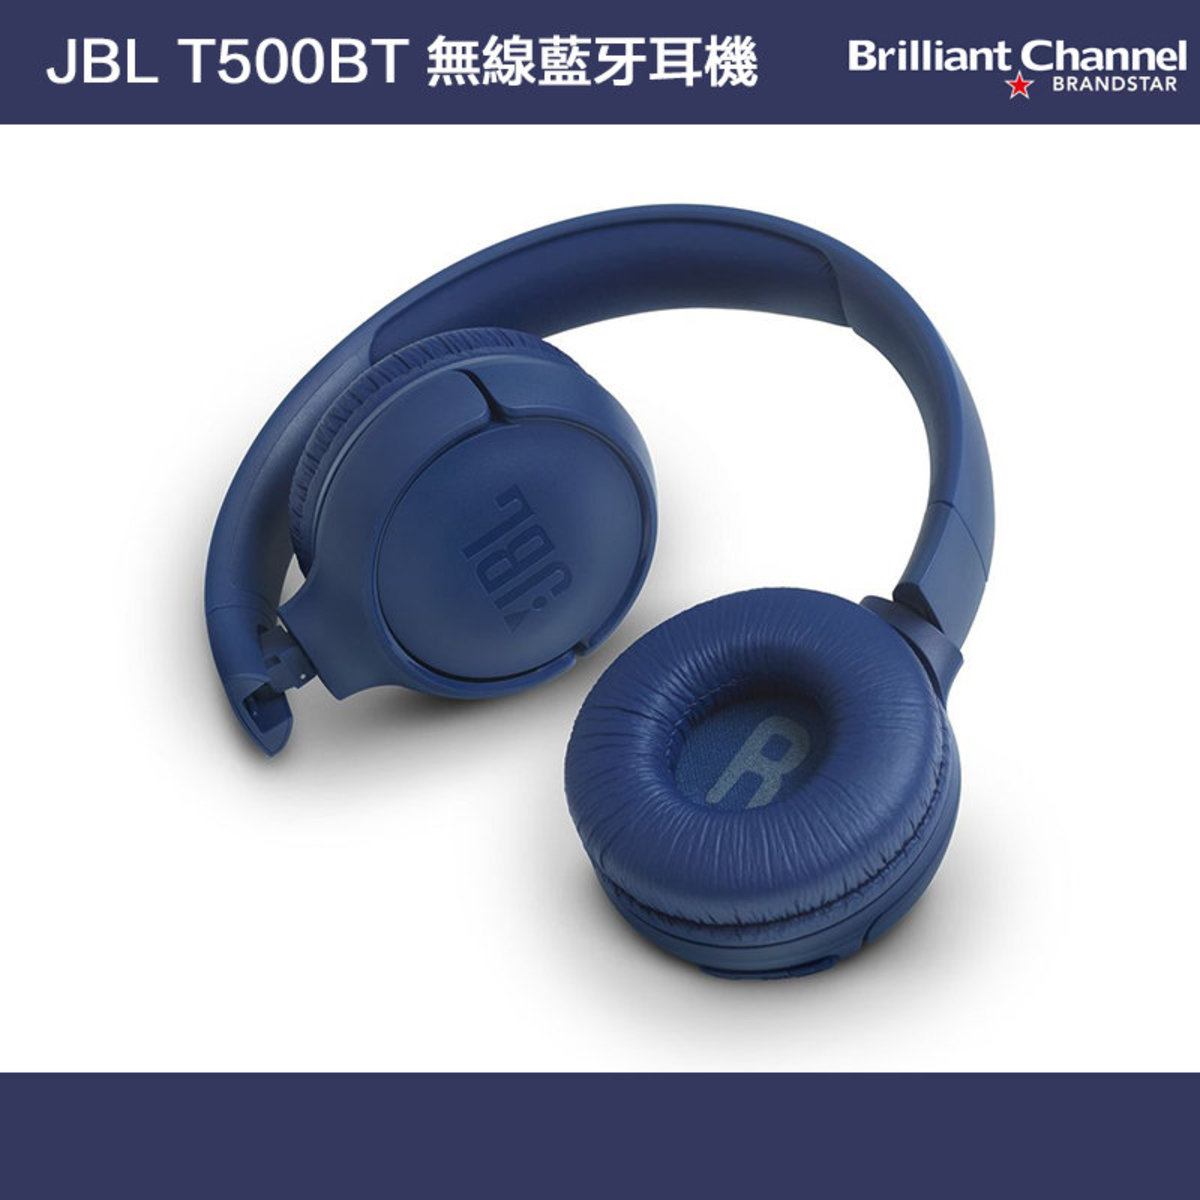 T500BT 無線頭戴式耳機 (藍色) (平行進口)